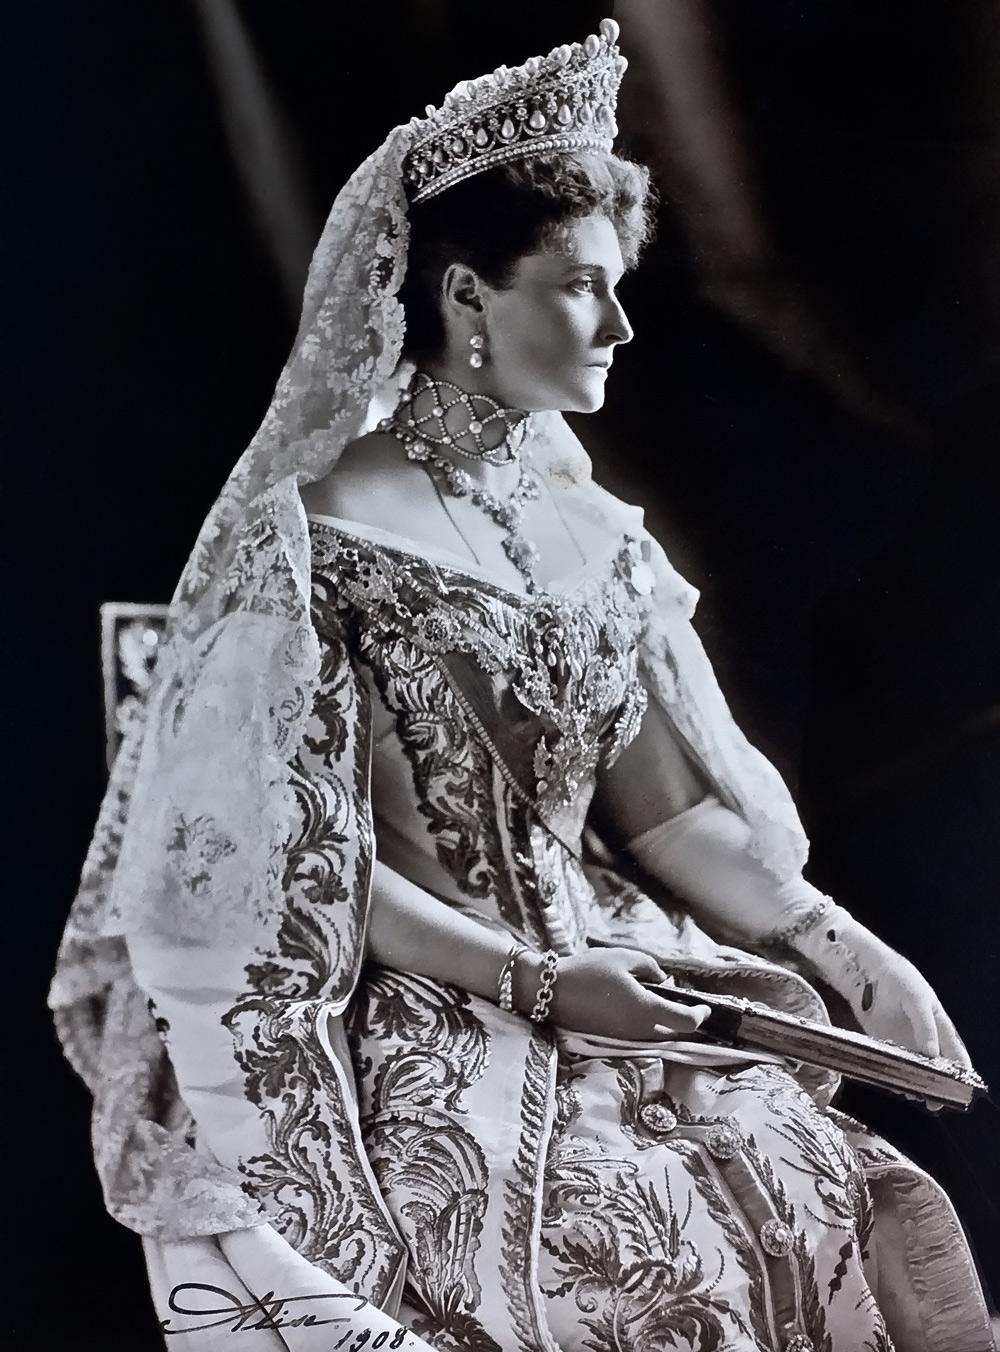 The last Russian Empress Alexandra Feodorovna, spouse of Nicholas II